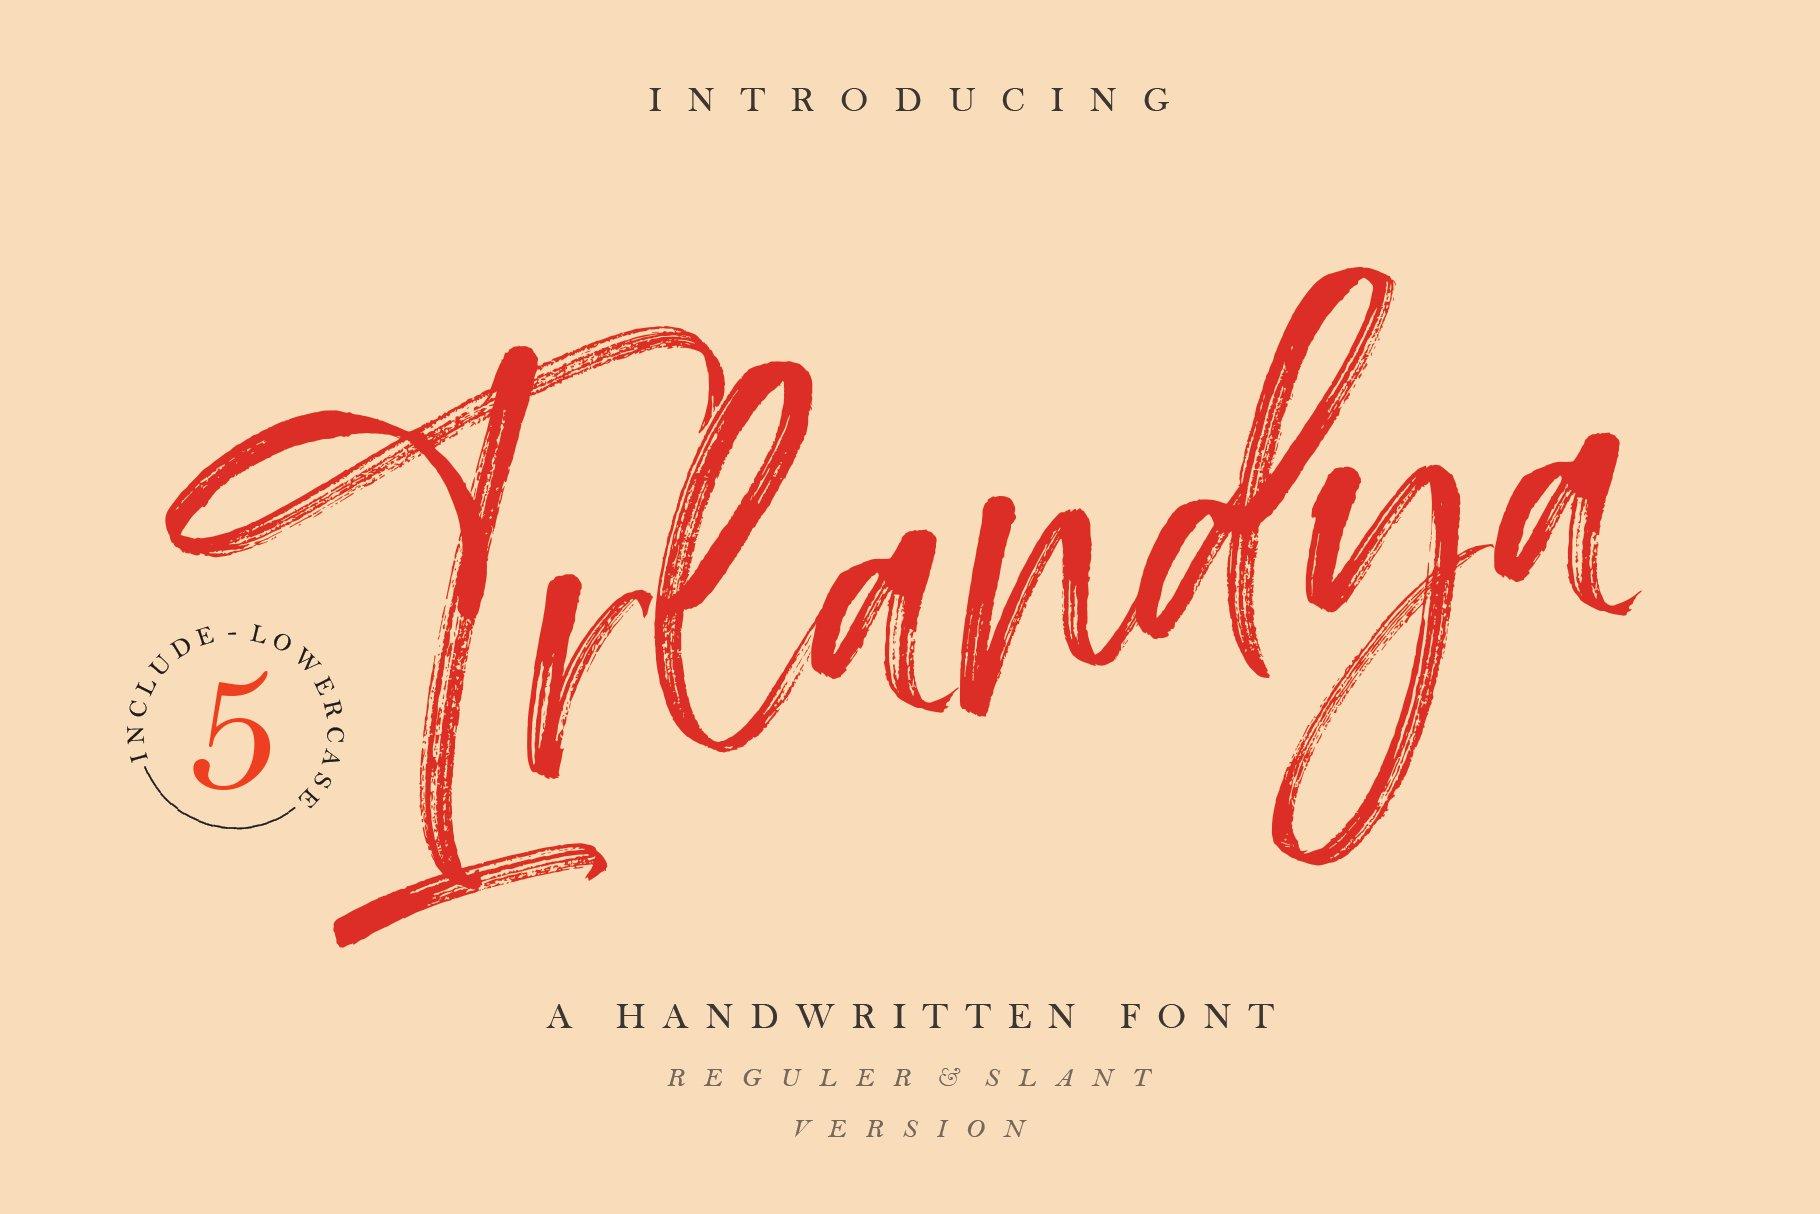 Irlandya - Handwritten font example image 1